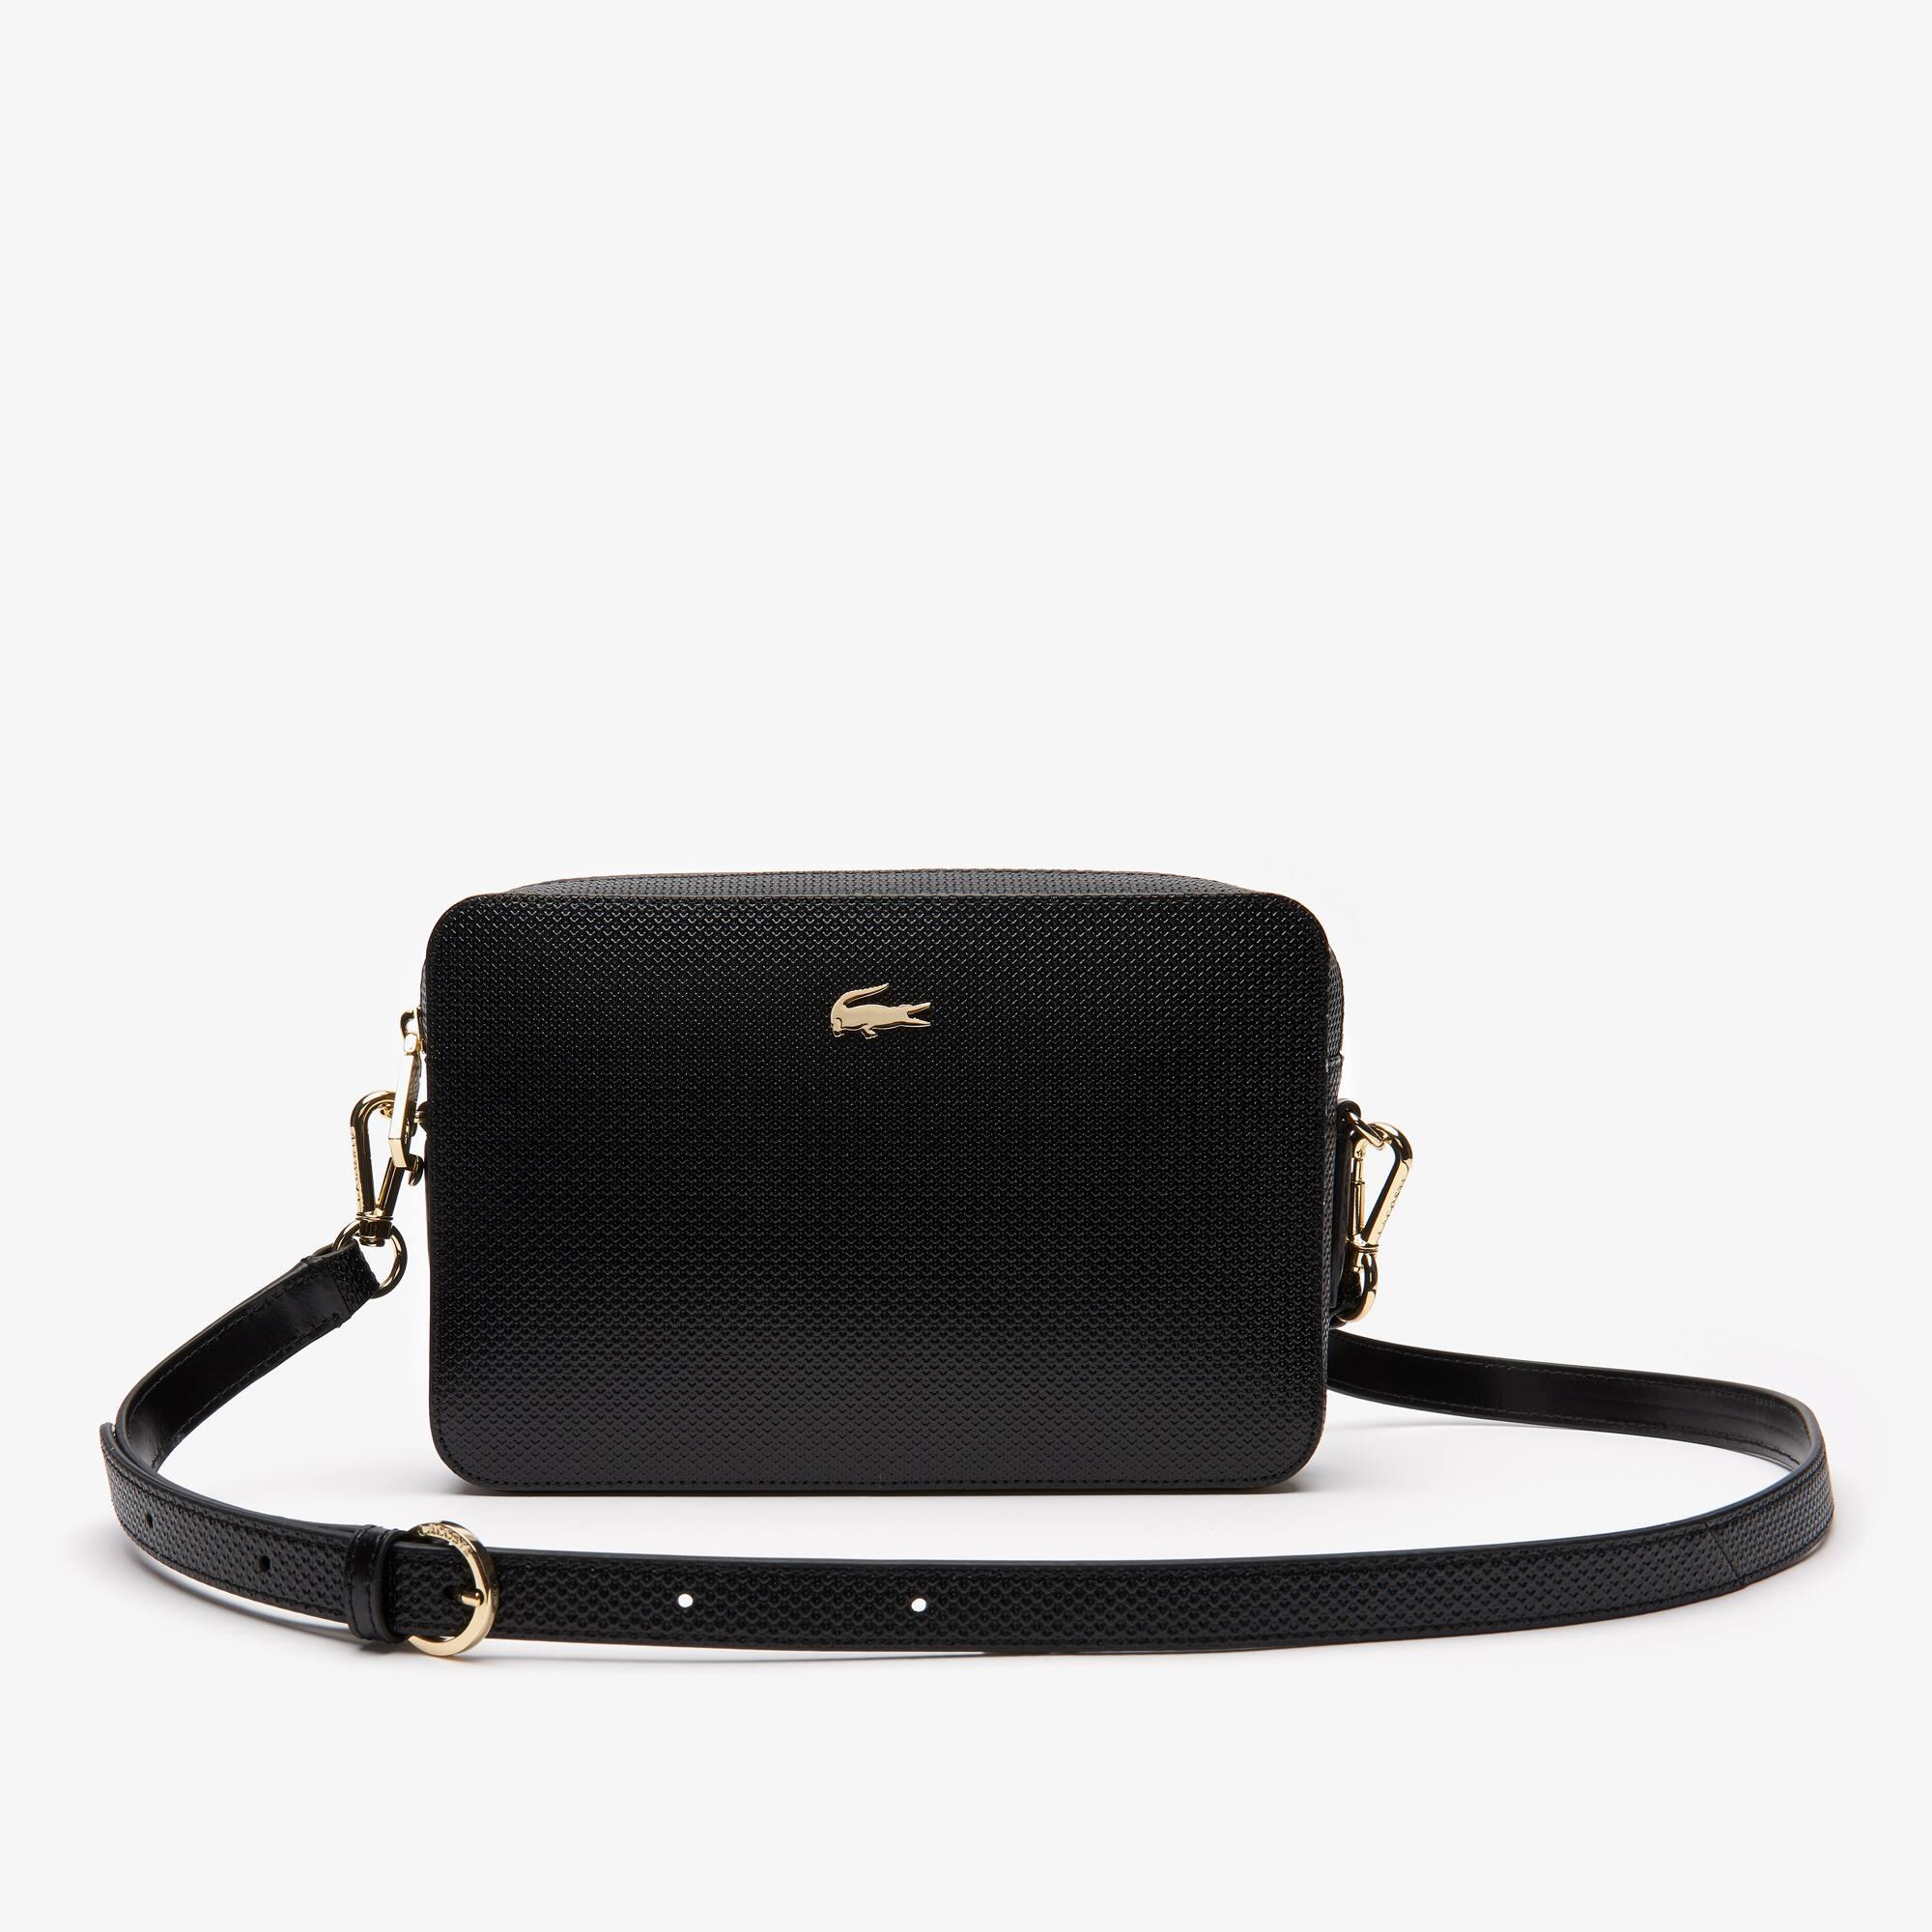 günstig kaufen c2e8a 3a23e Damen CHANTACO Tasche aus Piqué-Leder | LACOSTE